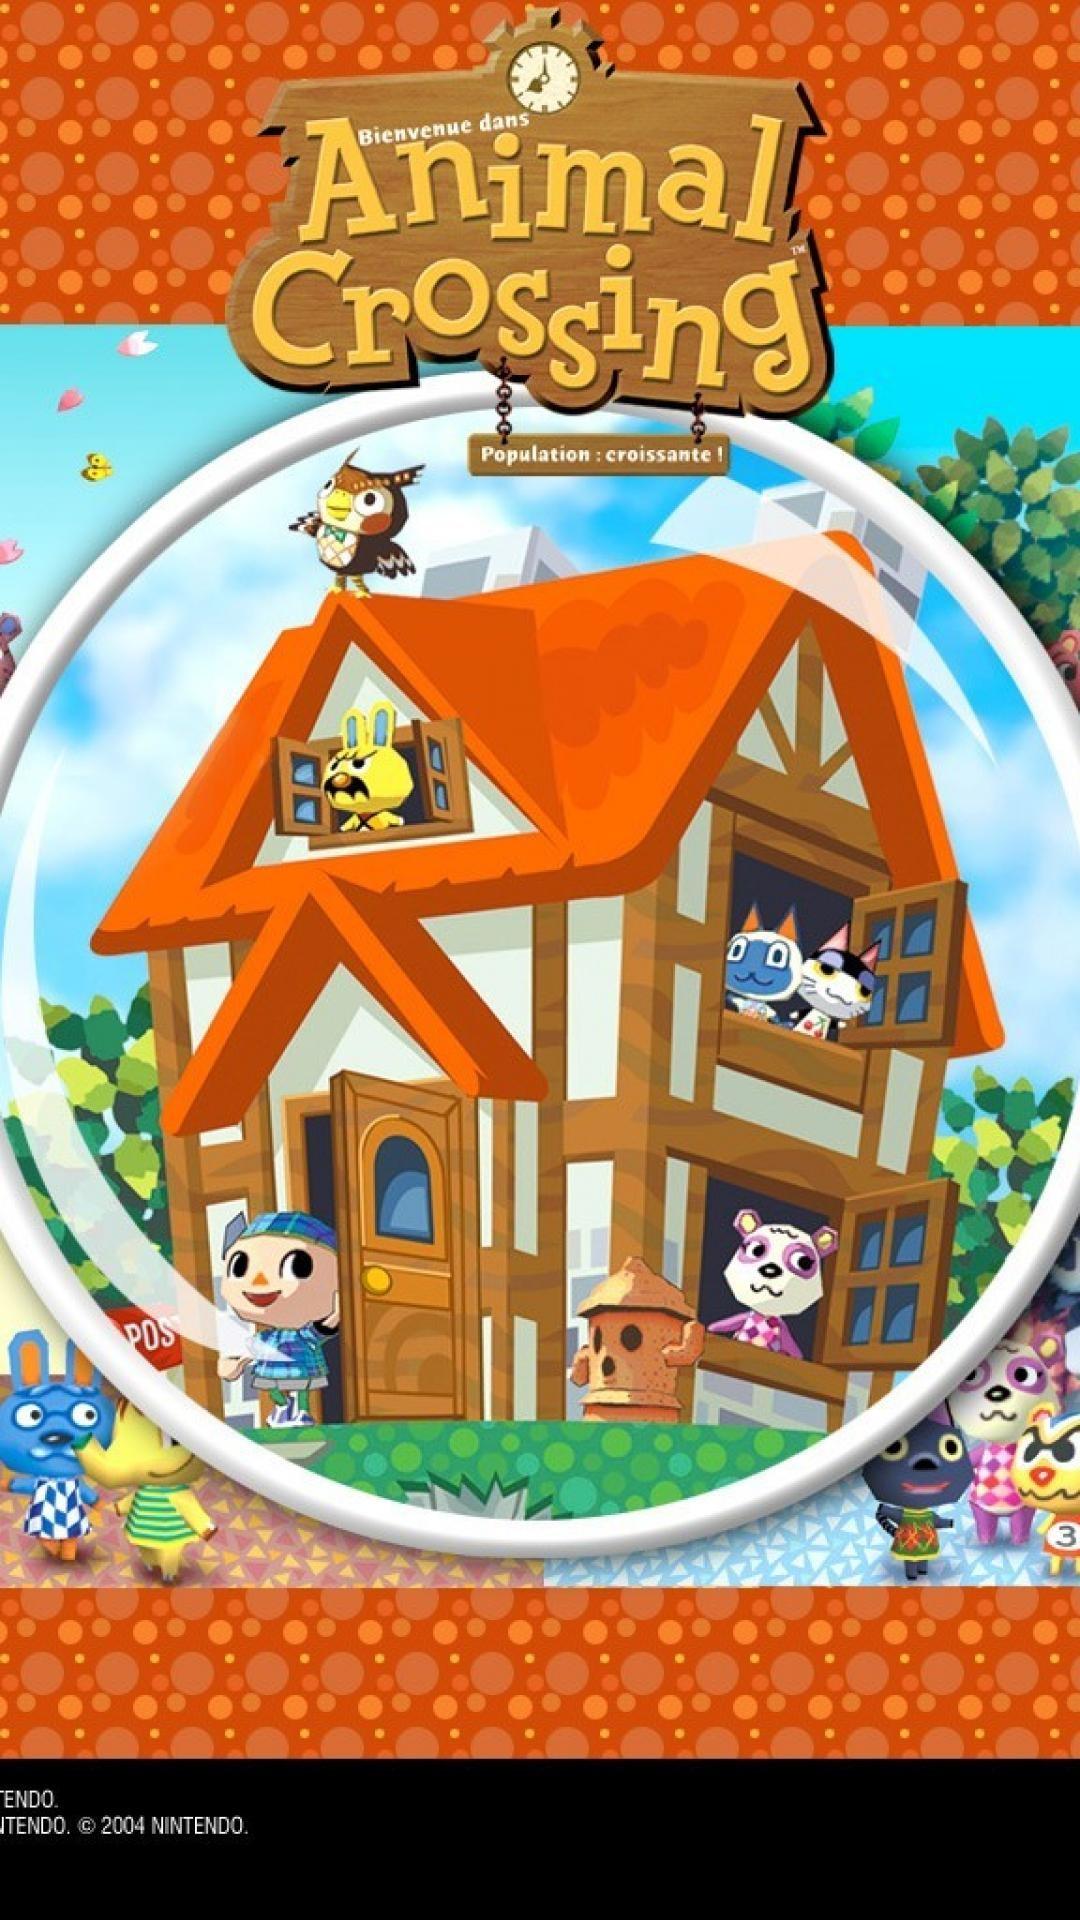 Nintendo gamecube animal crossing wallpaper   (35030)